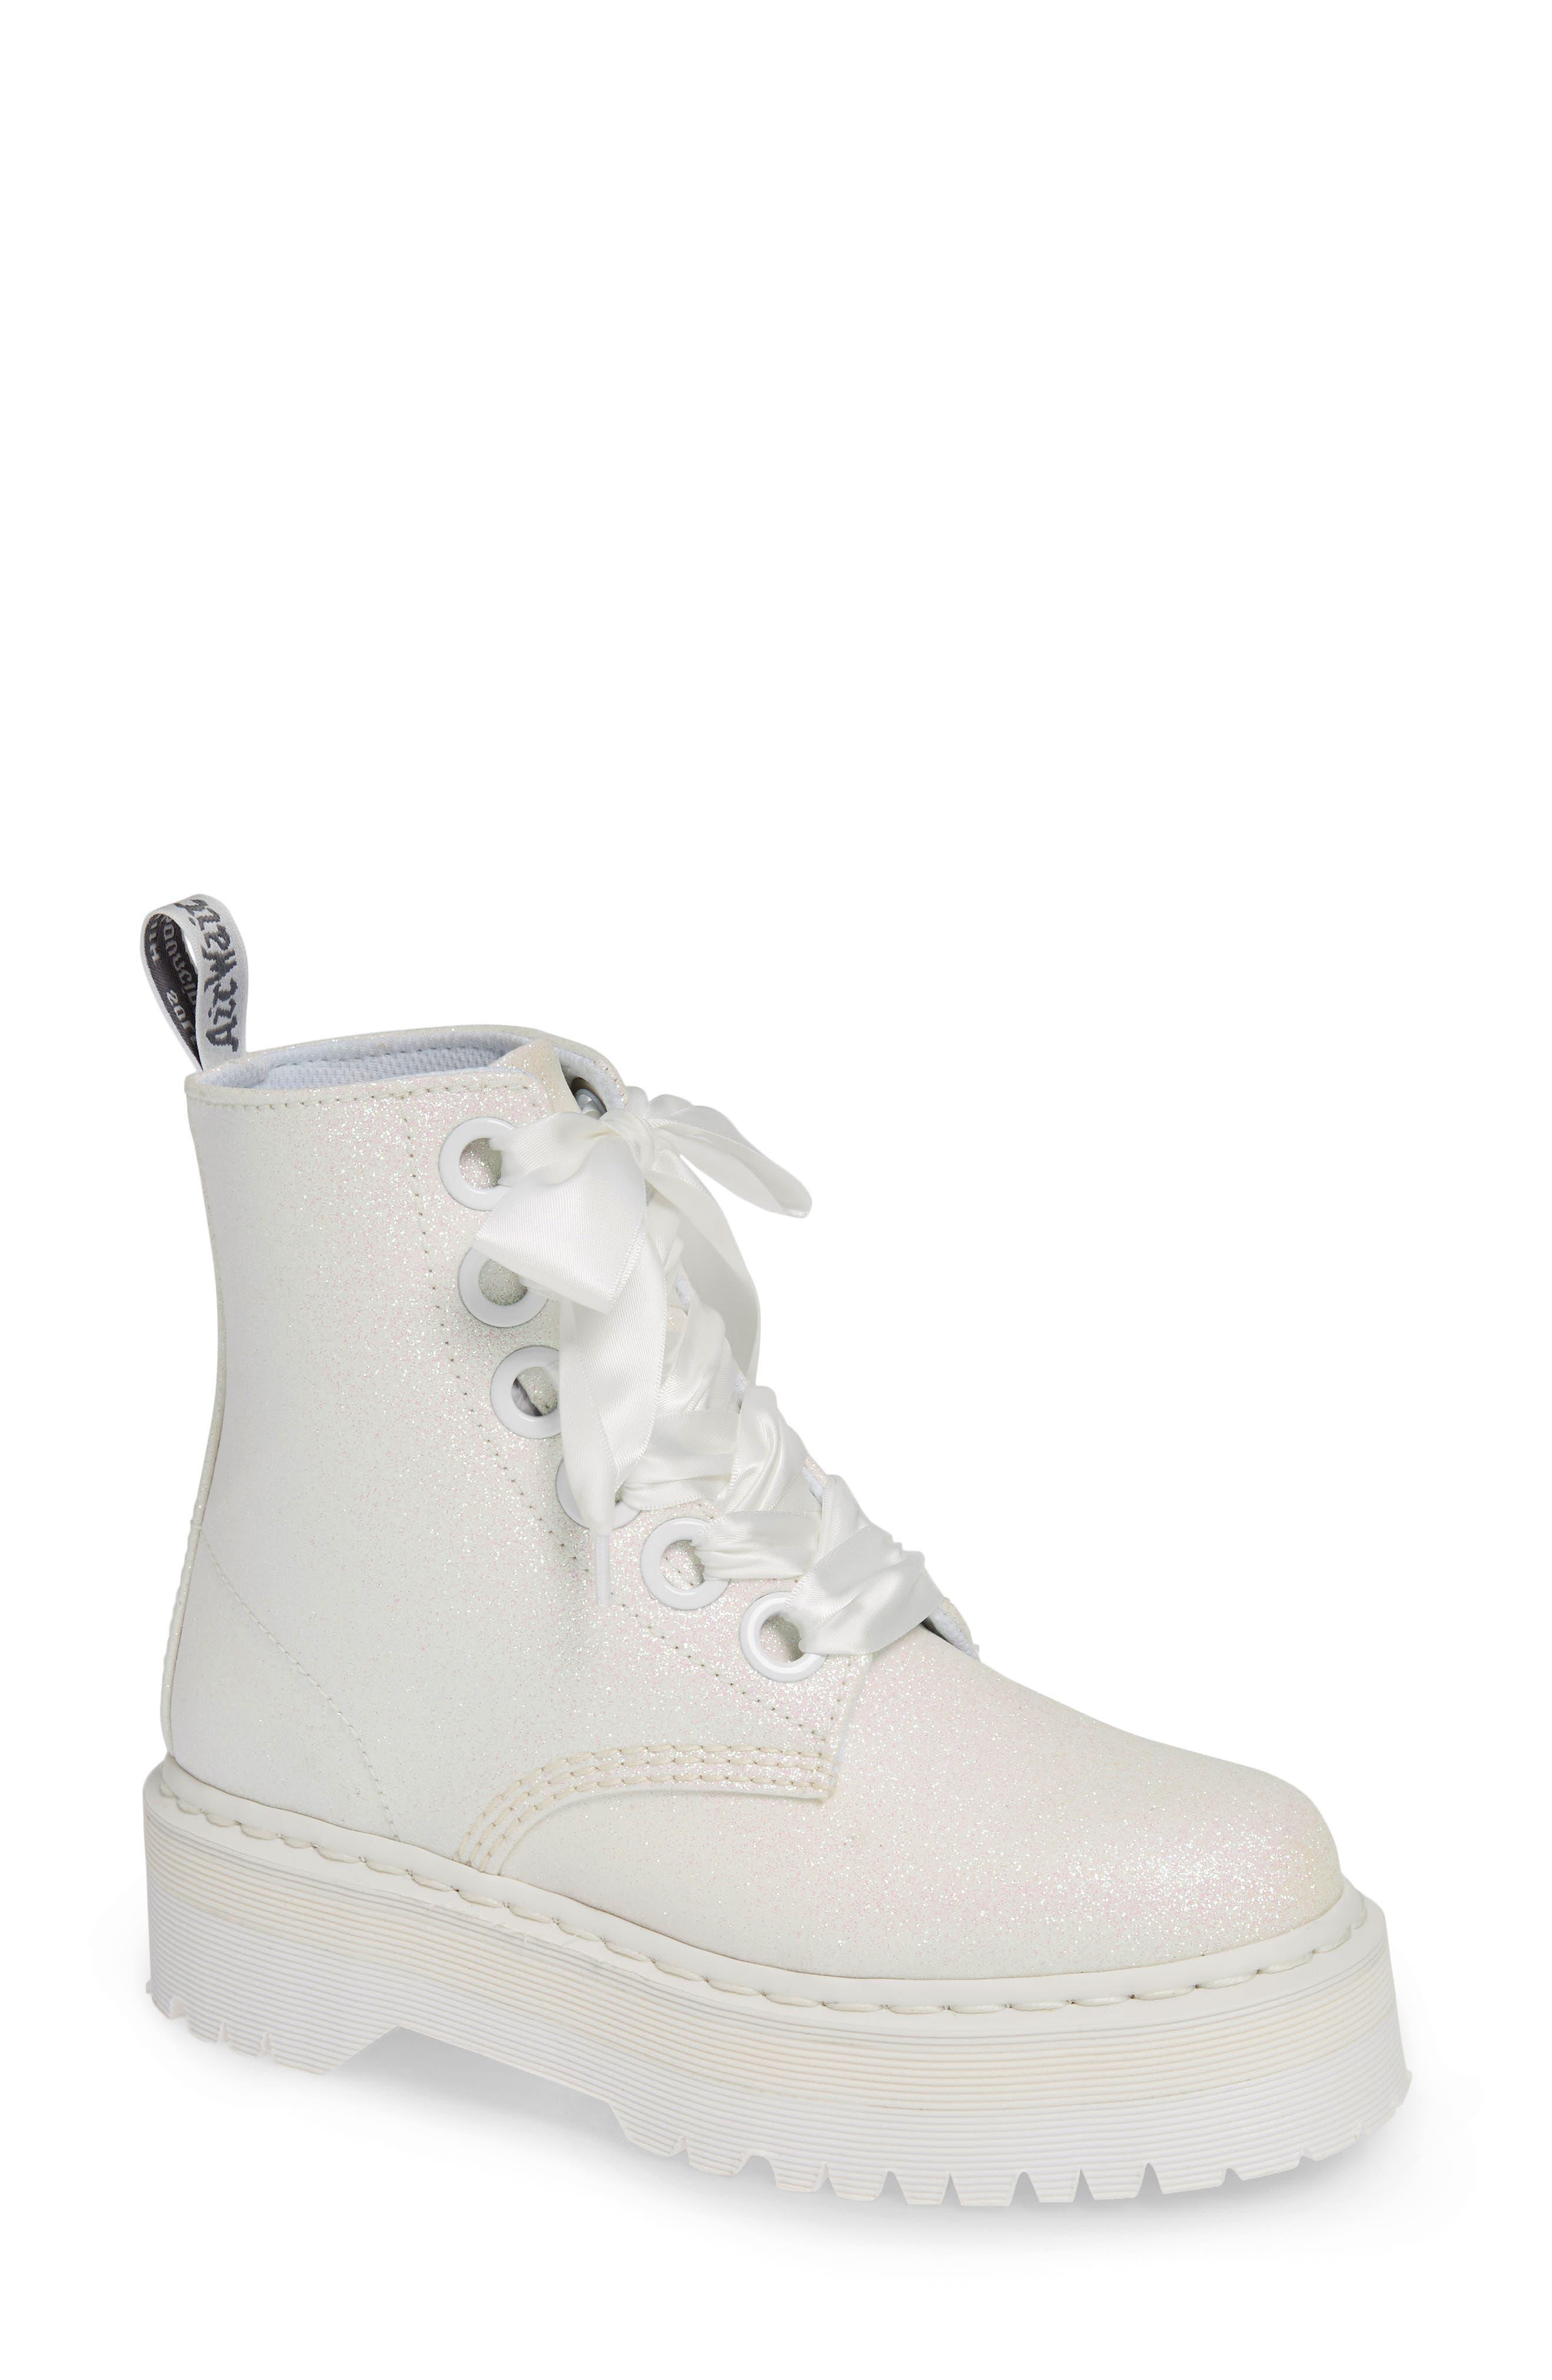 DR. MARTENS Molly Glitter Boot, Main, color, WHITE GLITTER